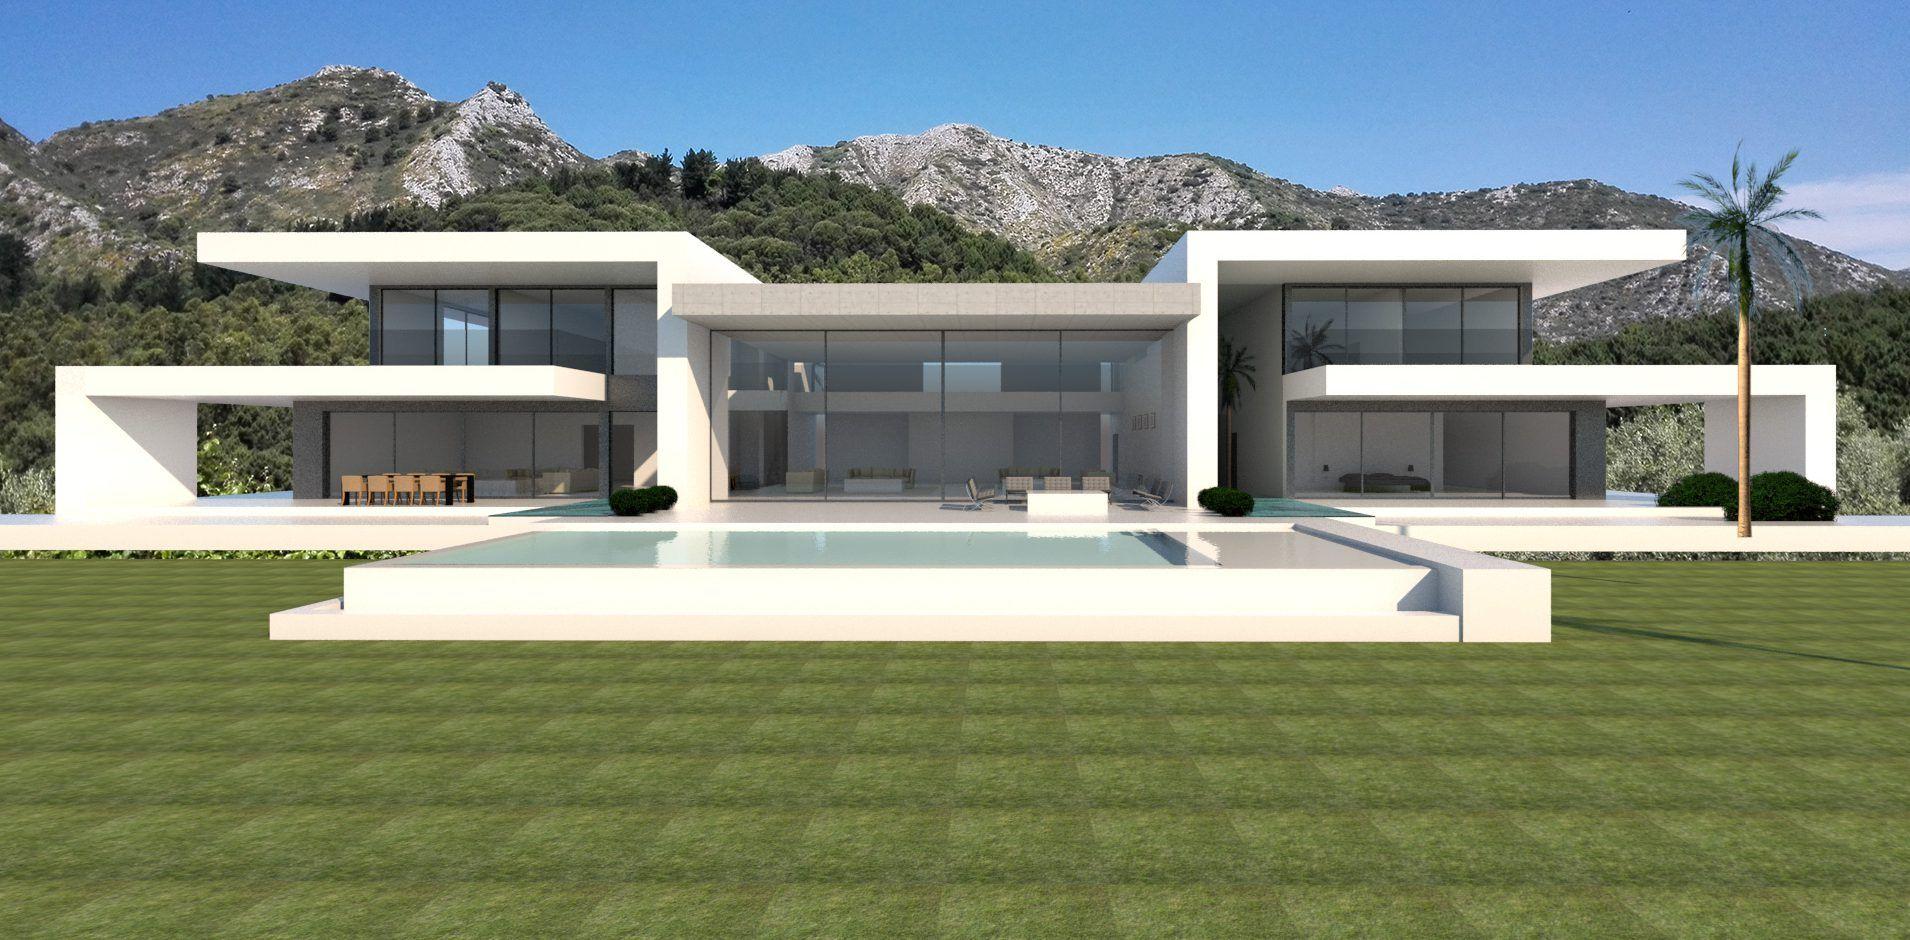 dominant views in marbella club golf belle casas casas modernas et casa modelo. Black Bedroom Furniture Sets. Home Design Ideas